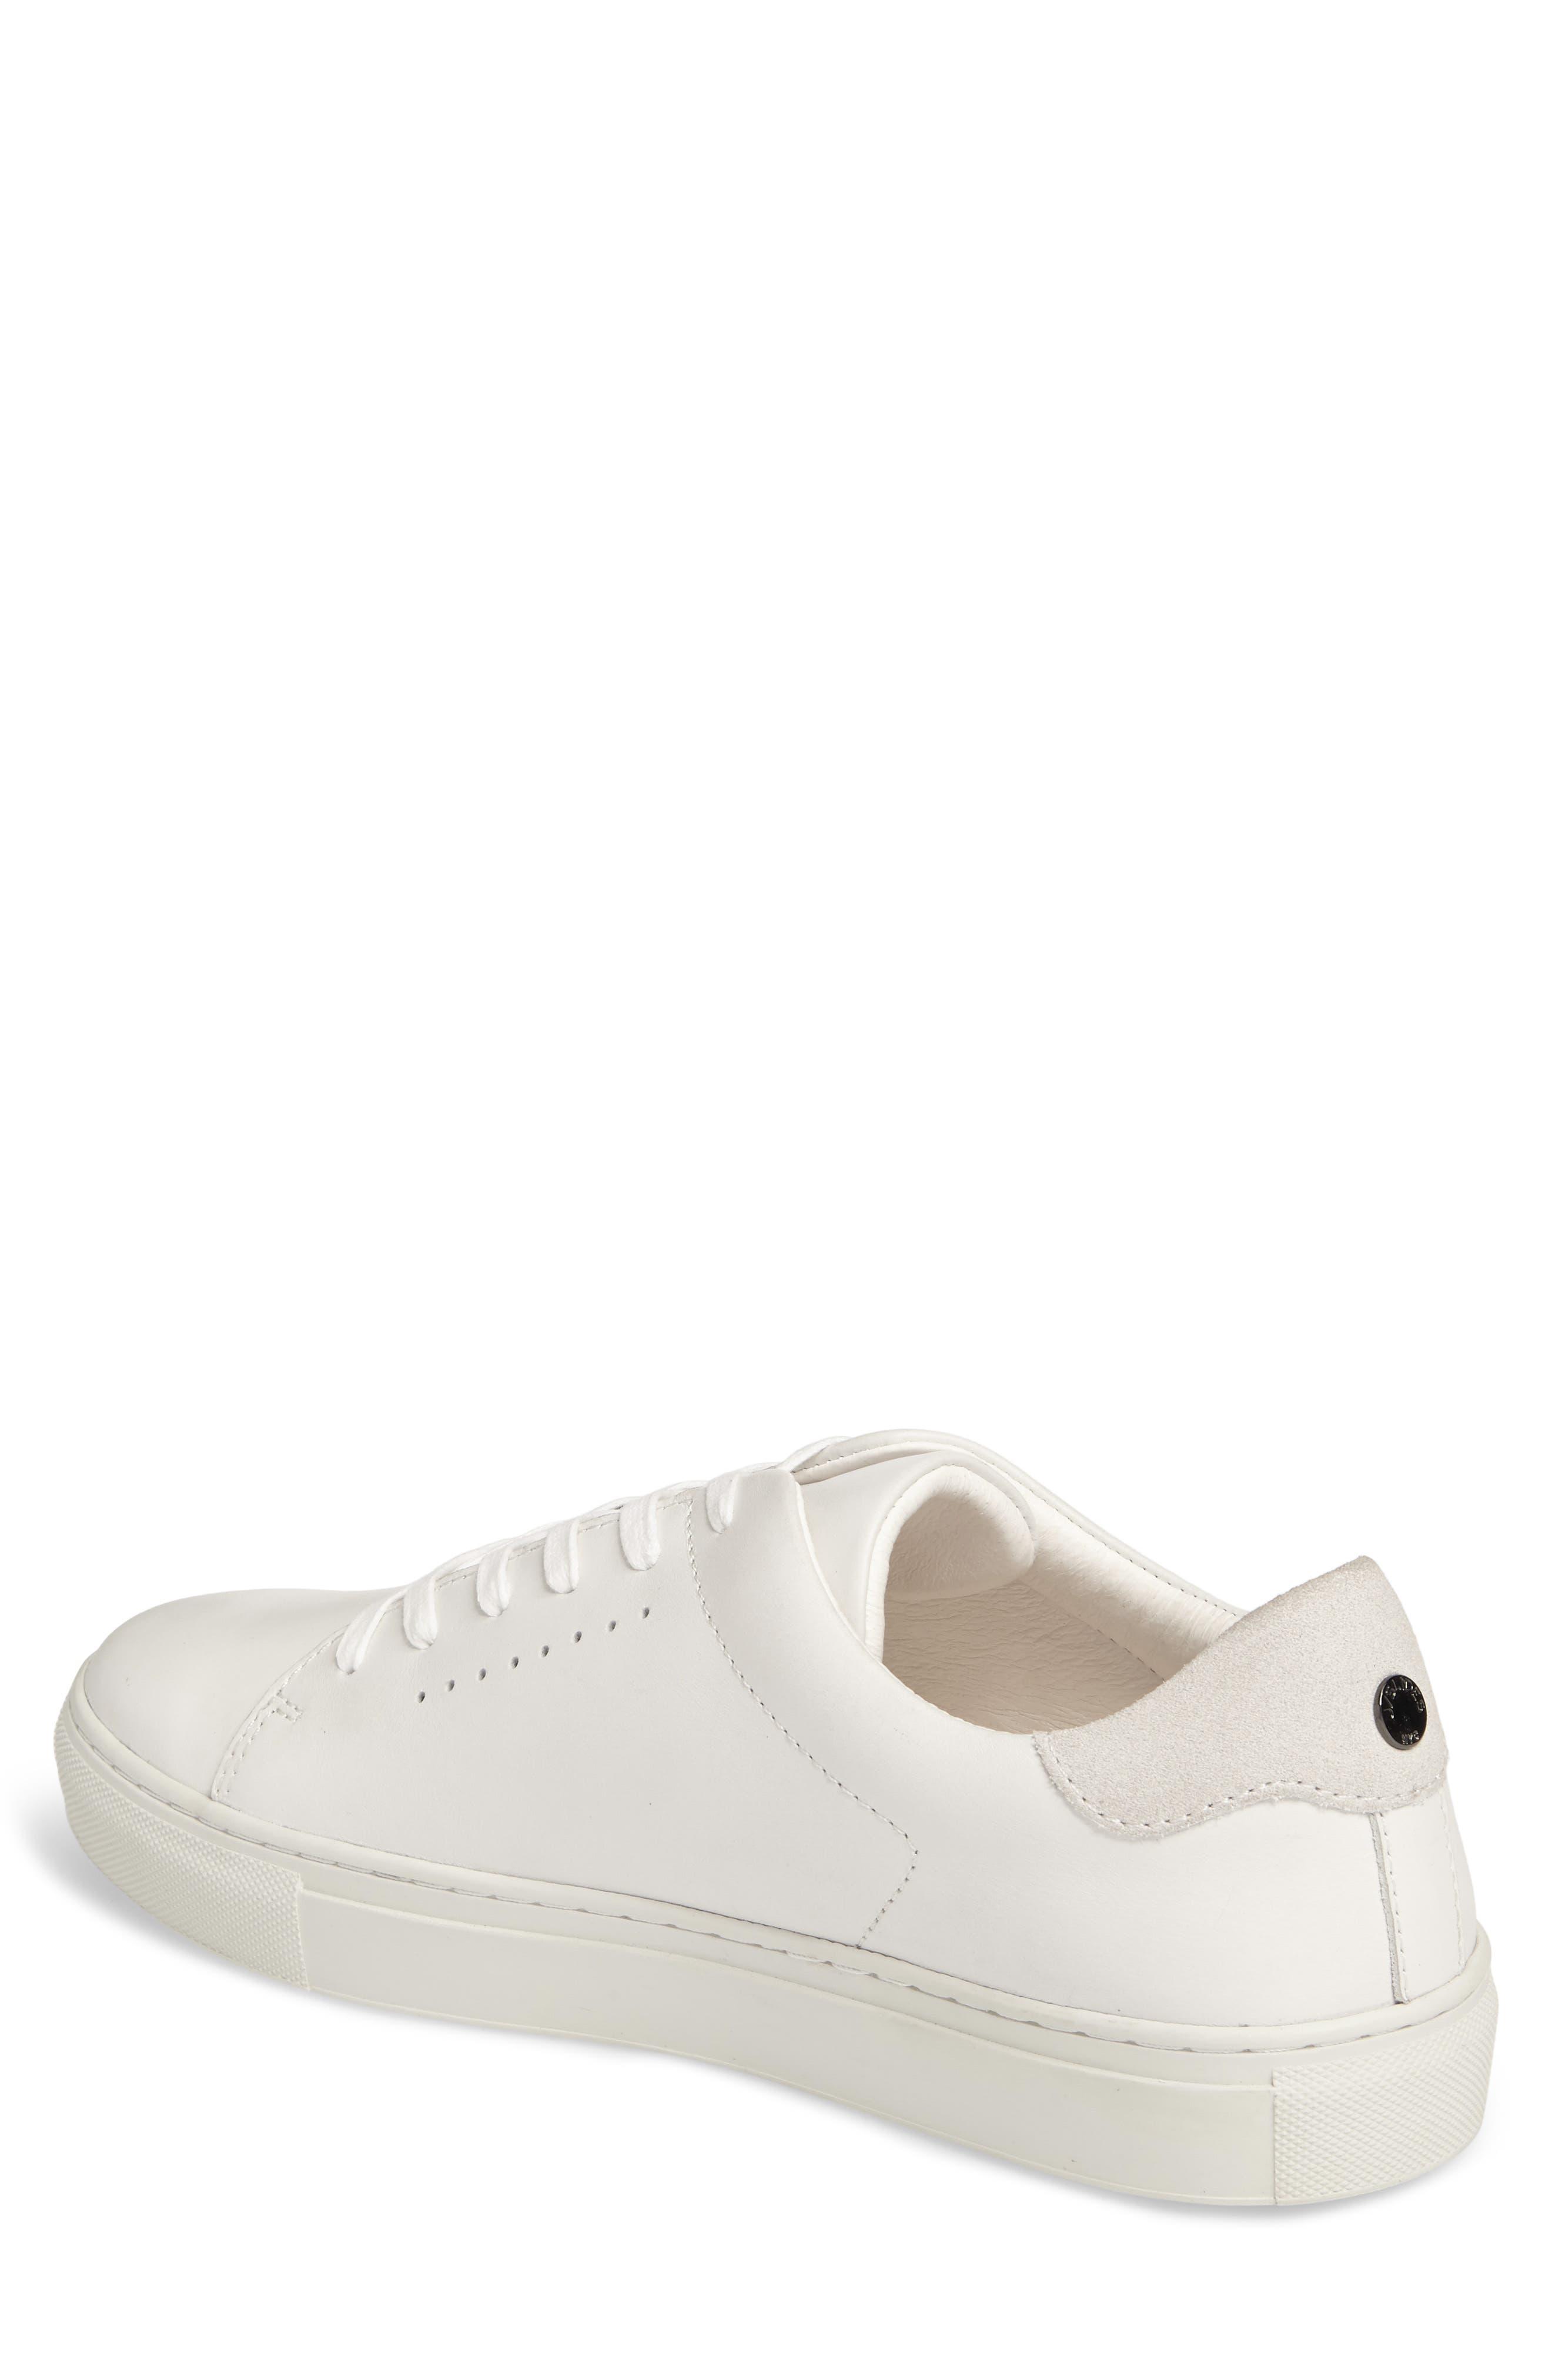 Desmond Sneaker,                             Alternate thumbnail 2, color,                             WHITE LEATHER